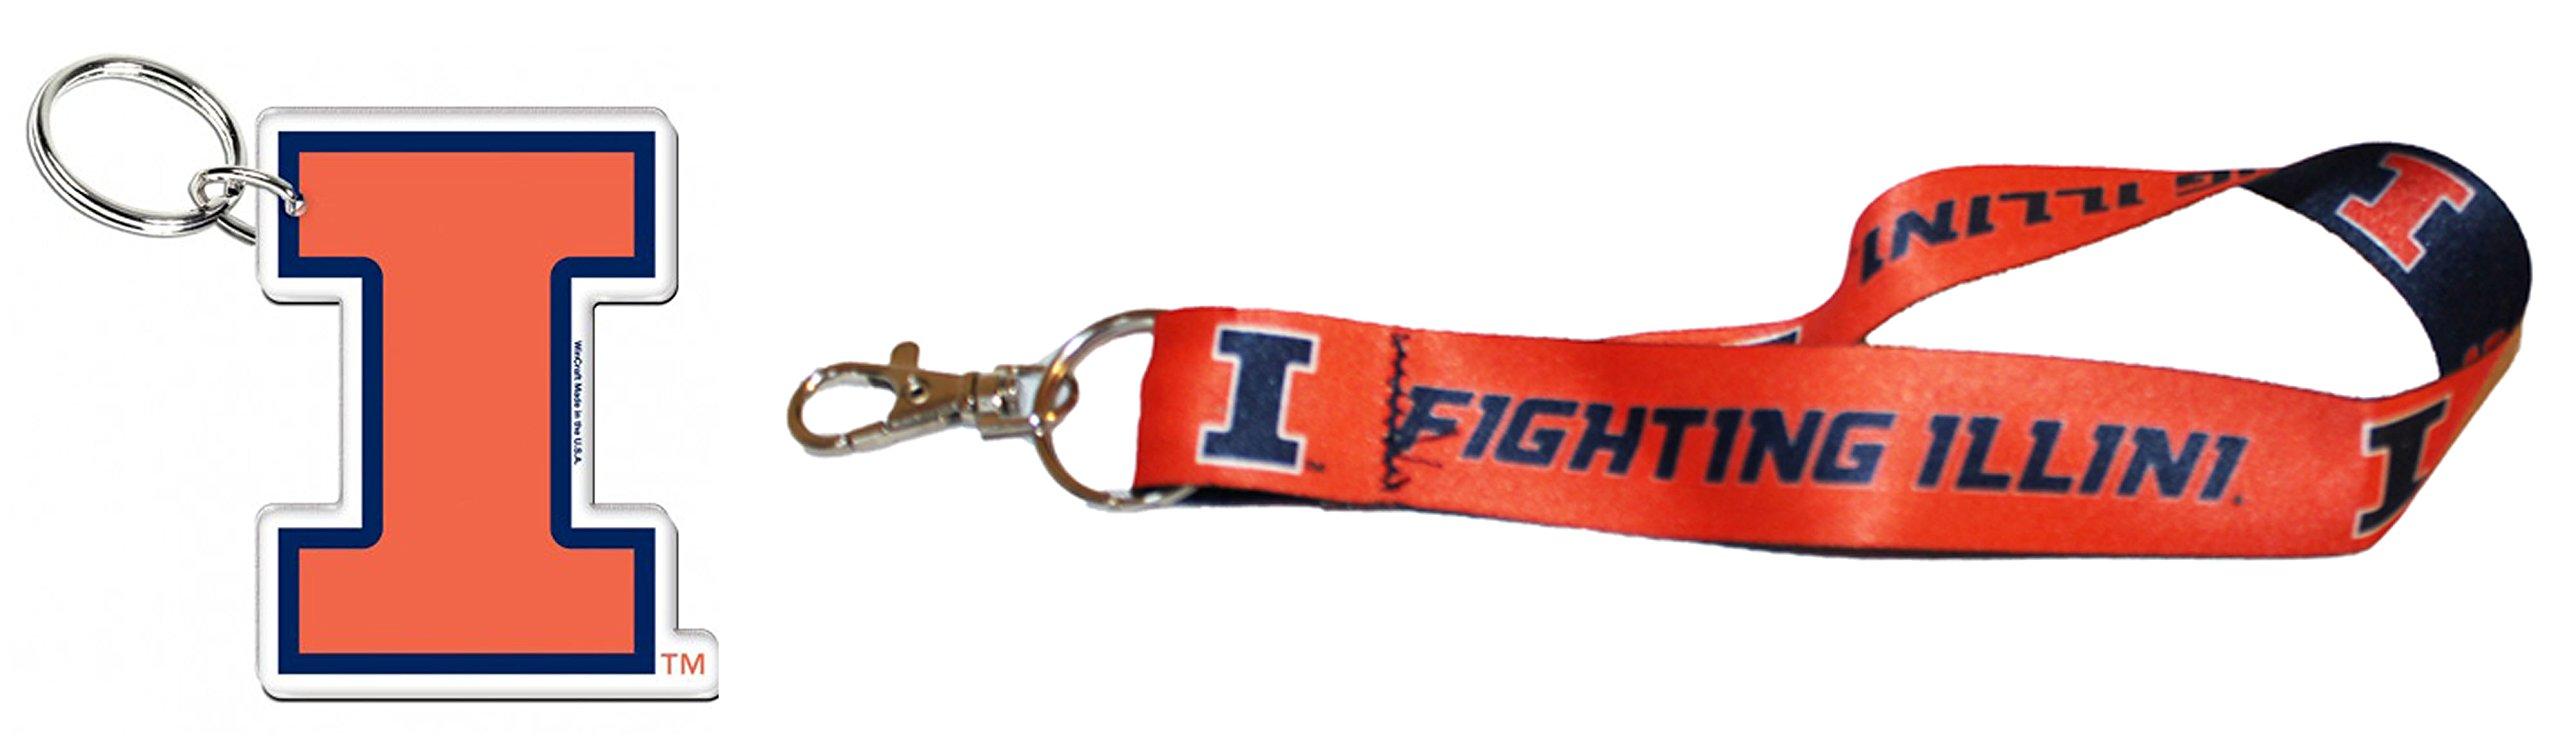 WinCraft Bundle 2 Items: University of Illinois Fighting Illini 1 Key Strap Key Chain and 1 Premium Key Ring